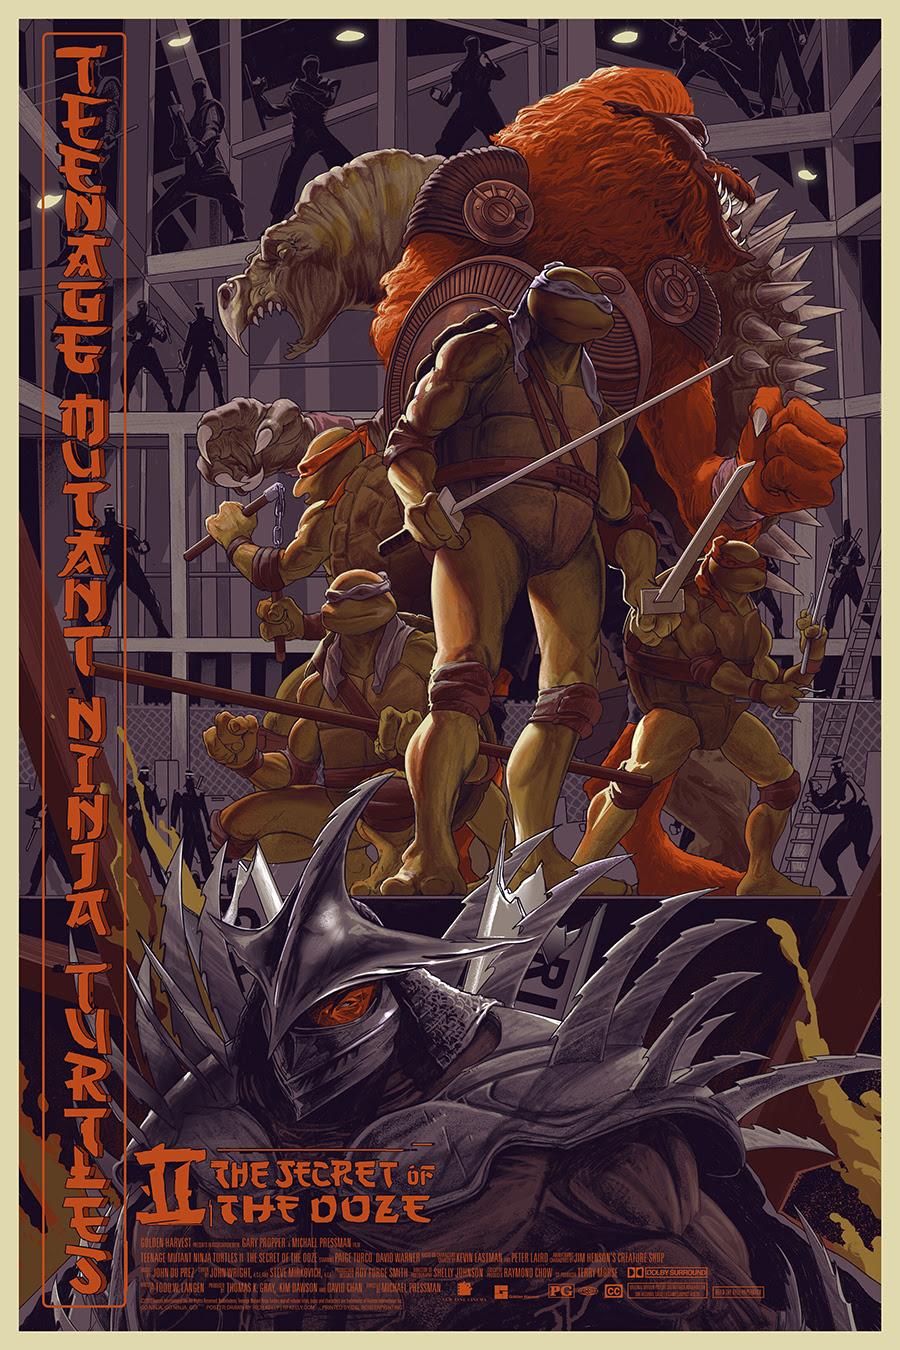 INSIDE THE ROCK POSTER FRAME BLOG: Teenage Mutant Ninja ...